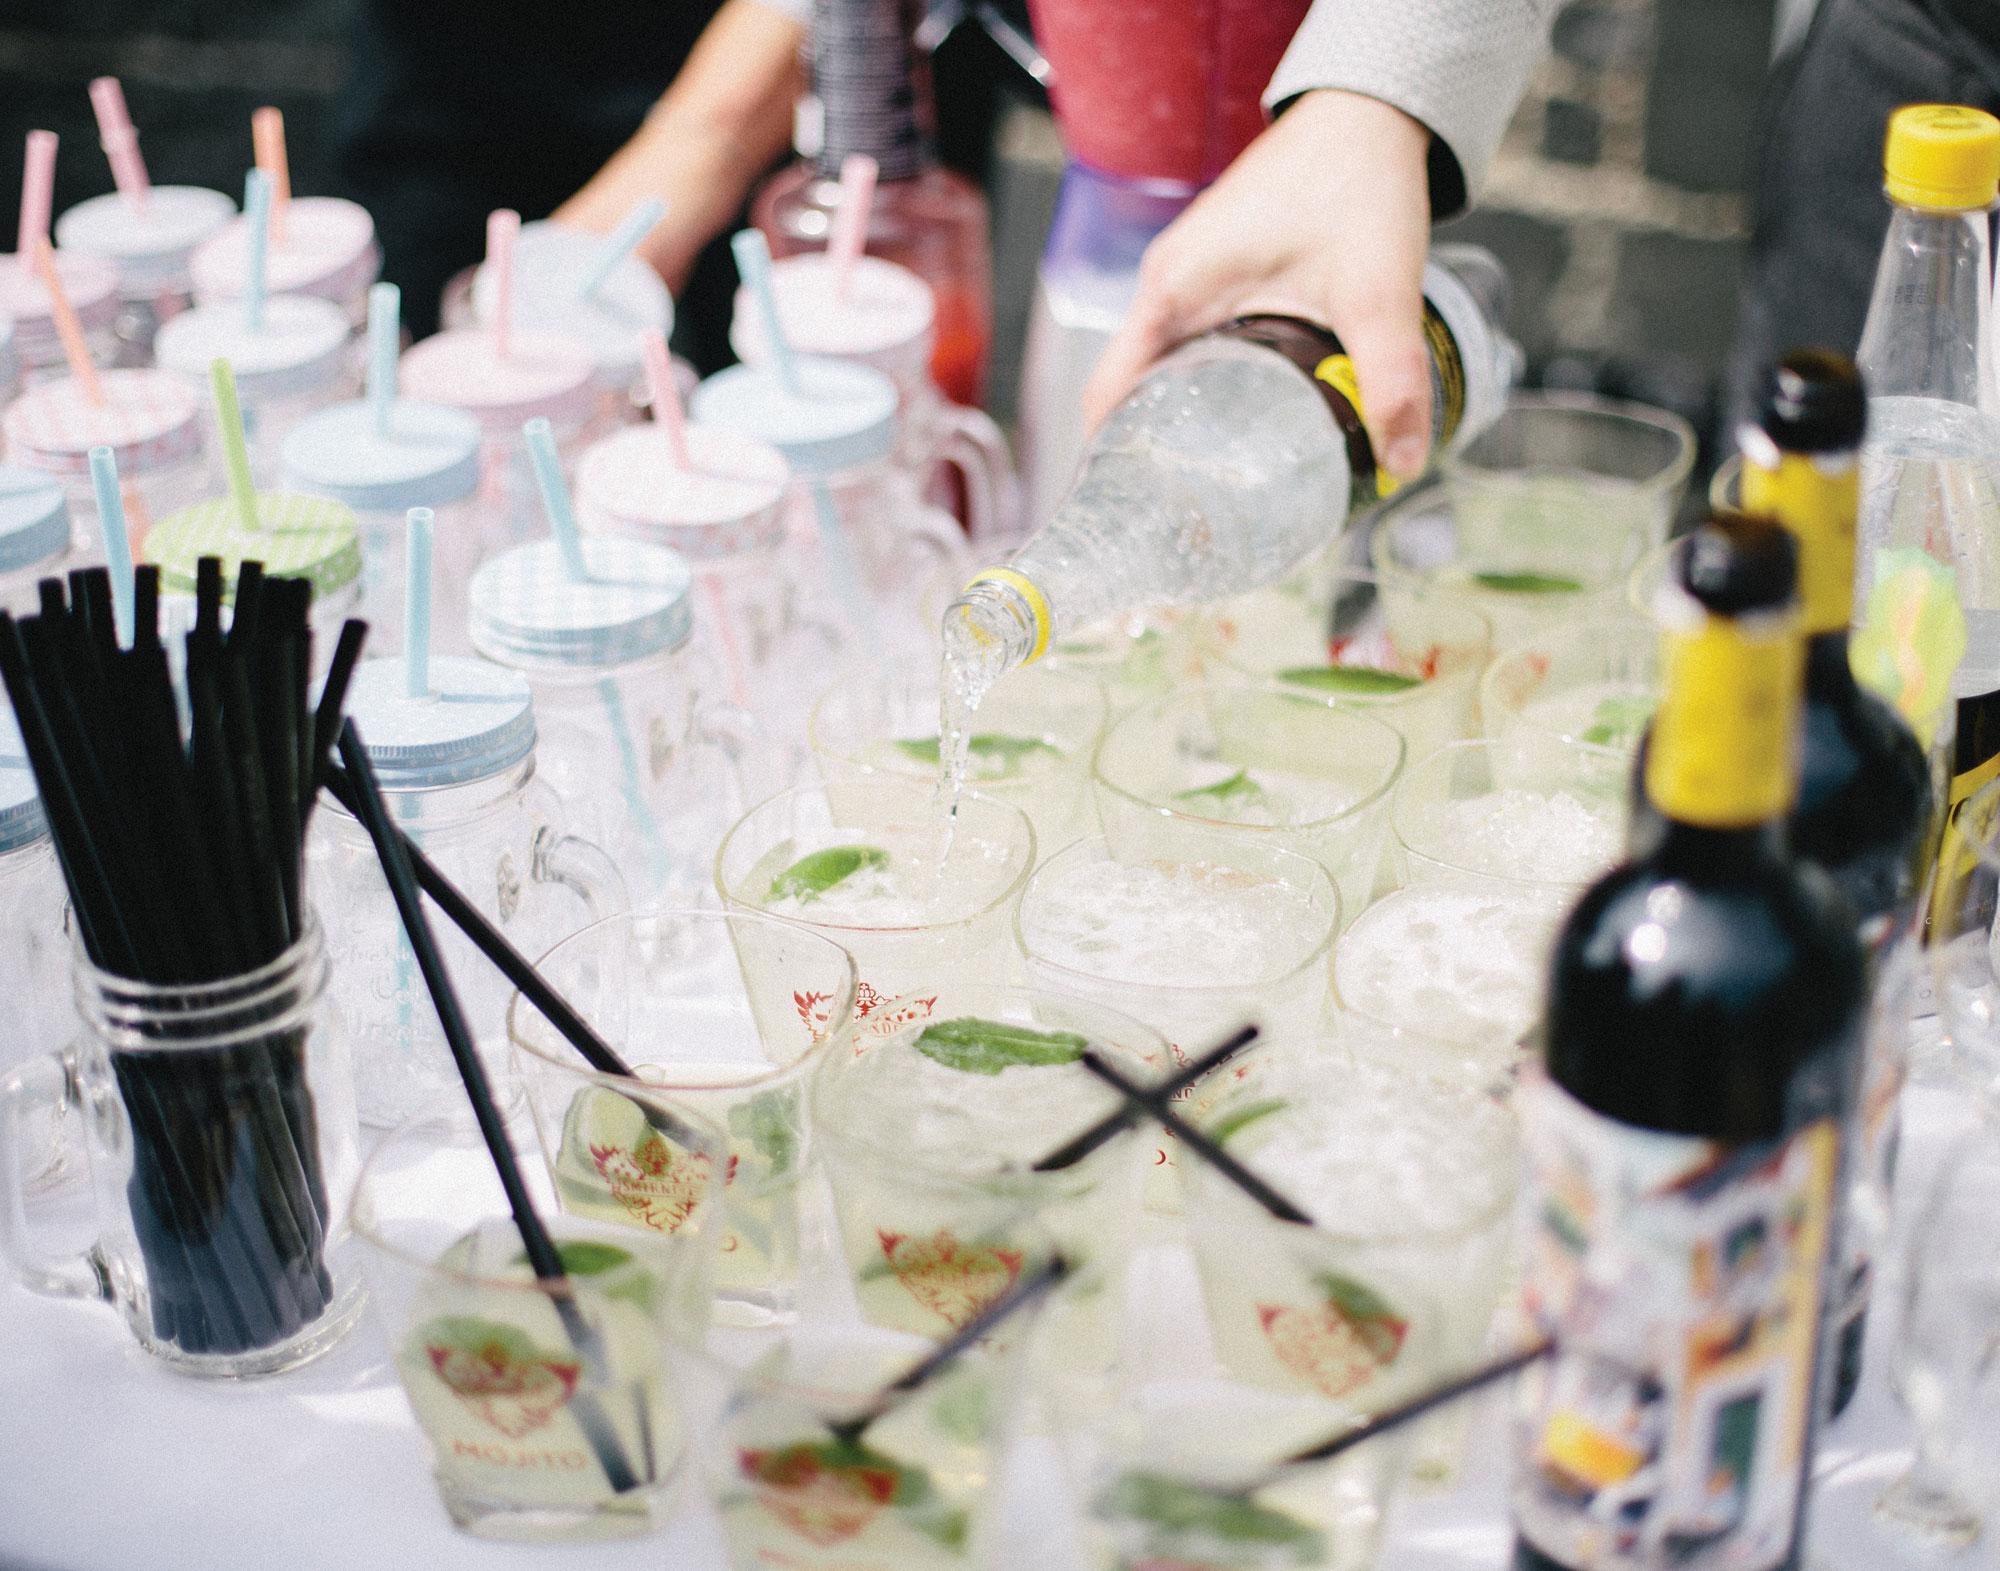 drinks-recption-ideas-for-wedding-northern-ireland.jpg